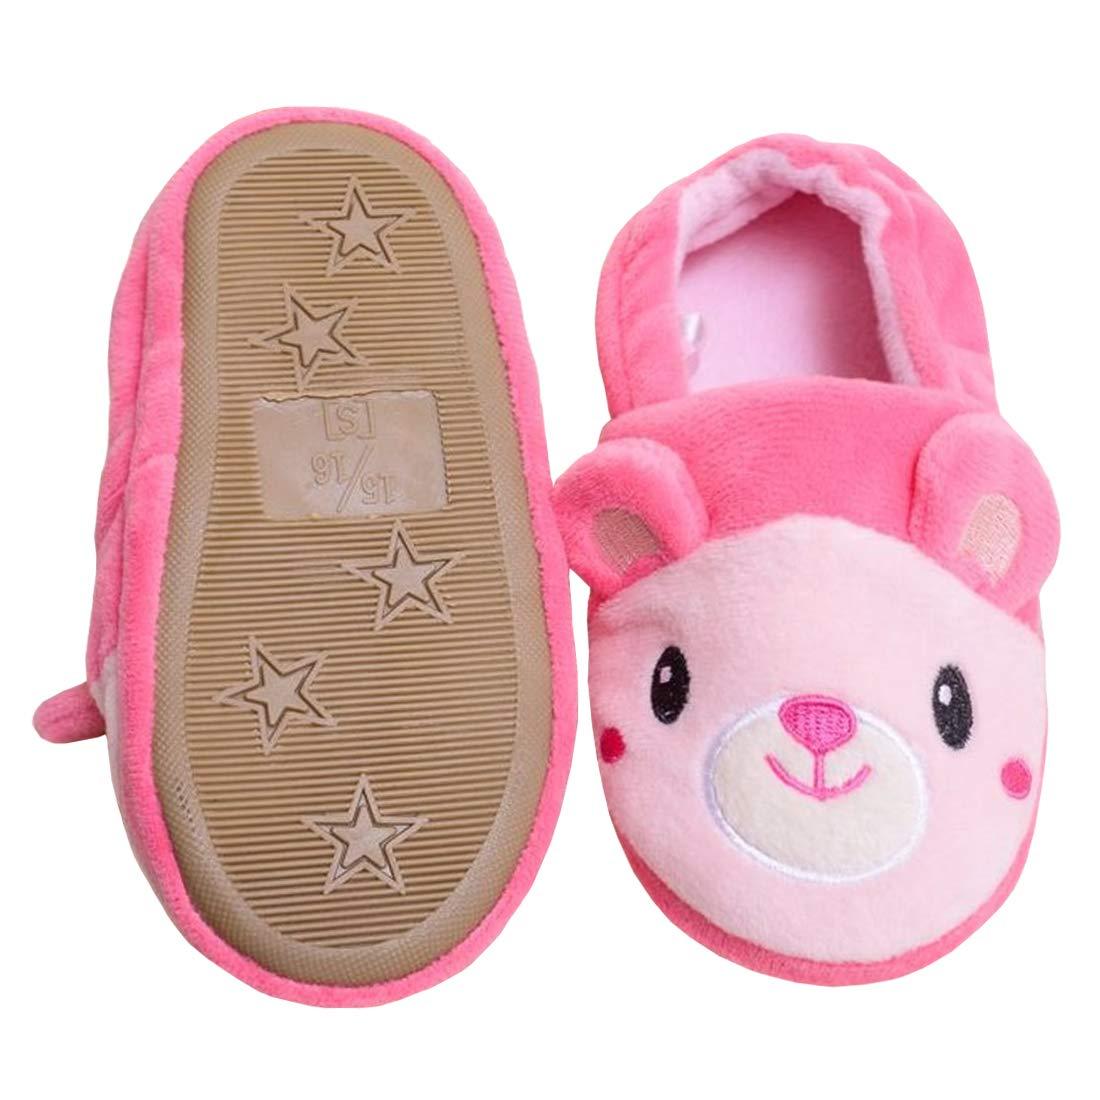 Beeliss Toddler Girls Slippers Cartoon Plush Warm Shoes BLS-8814